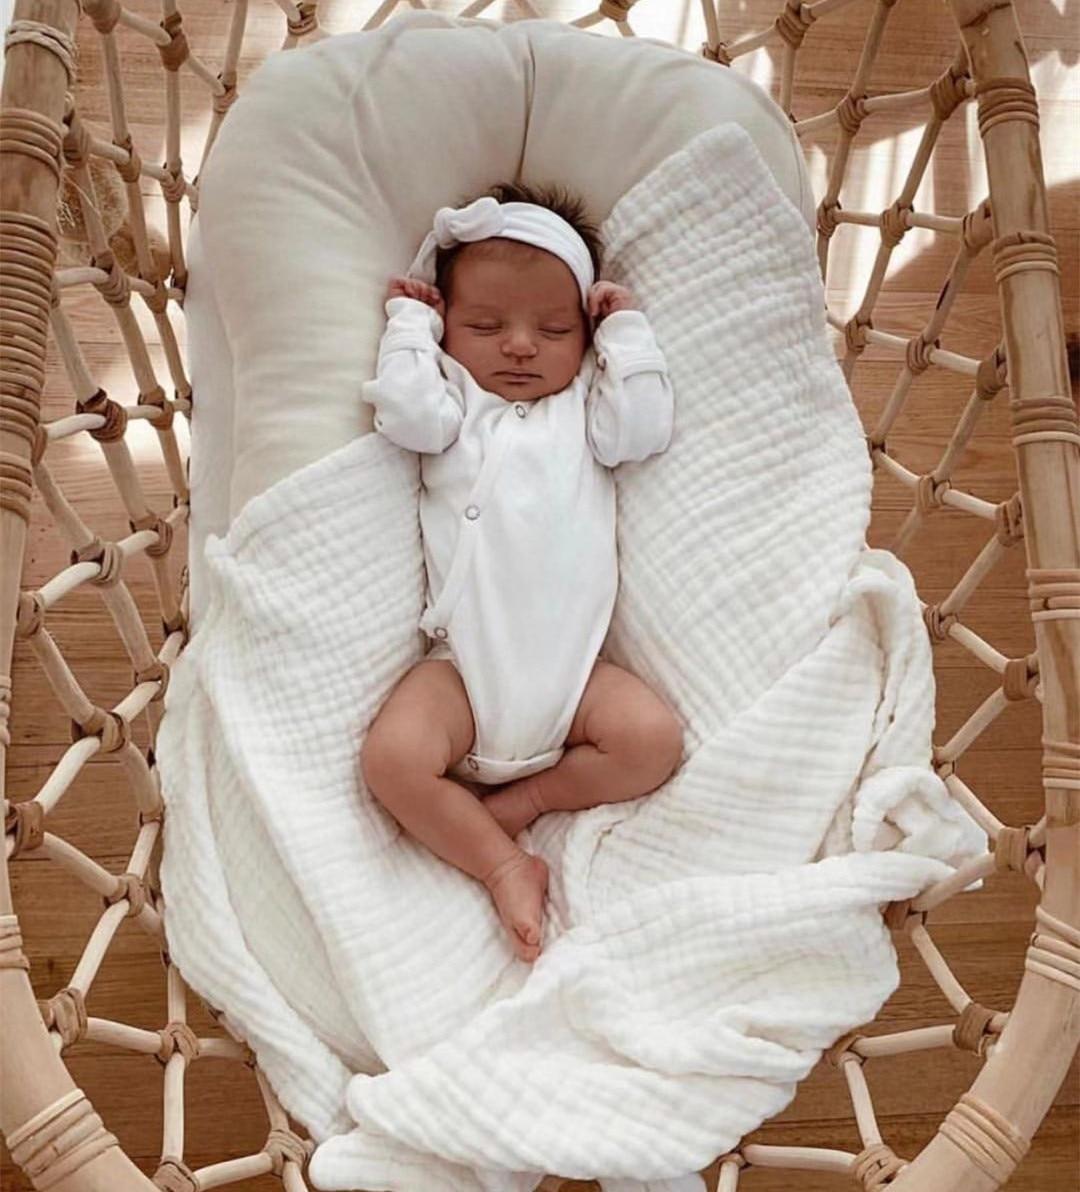 75*45cm Baby Nest Bed Portable Crib Travel Bed Baby Lounger Docatot Cosleeper Nursery Decor